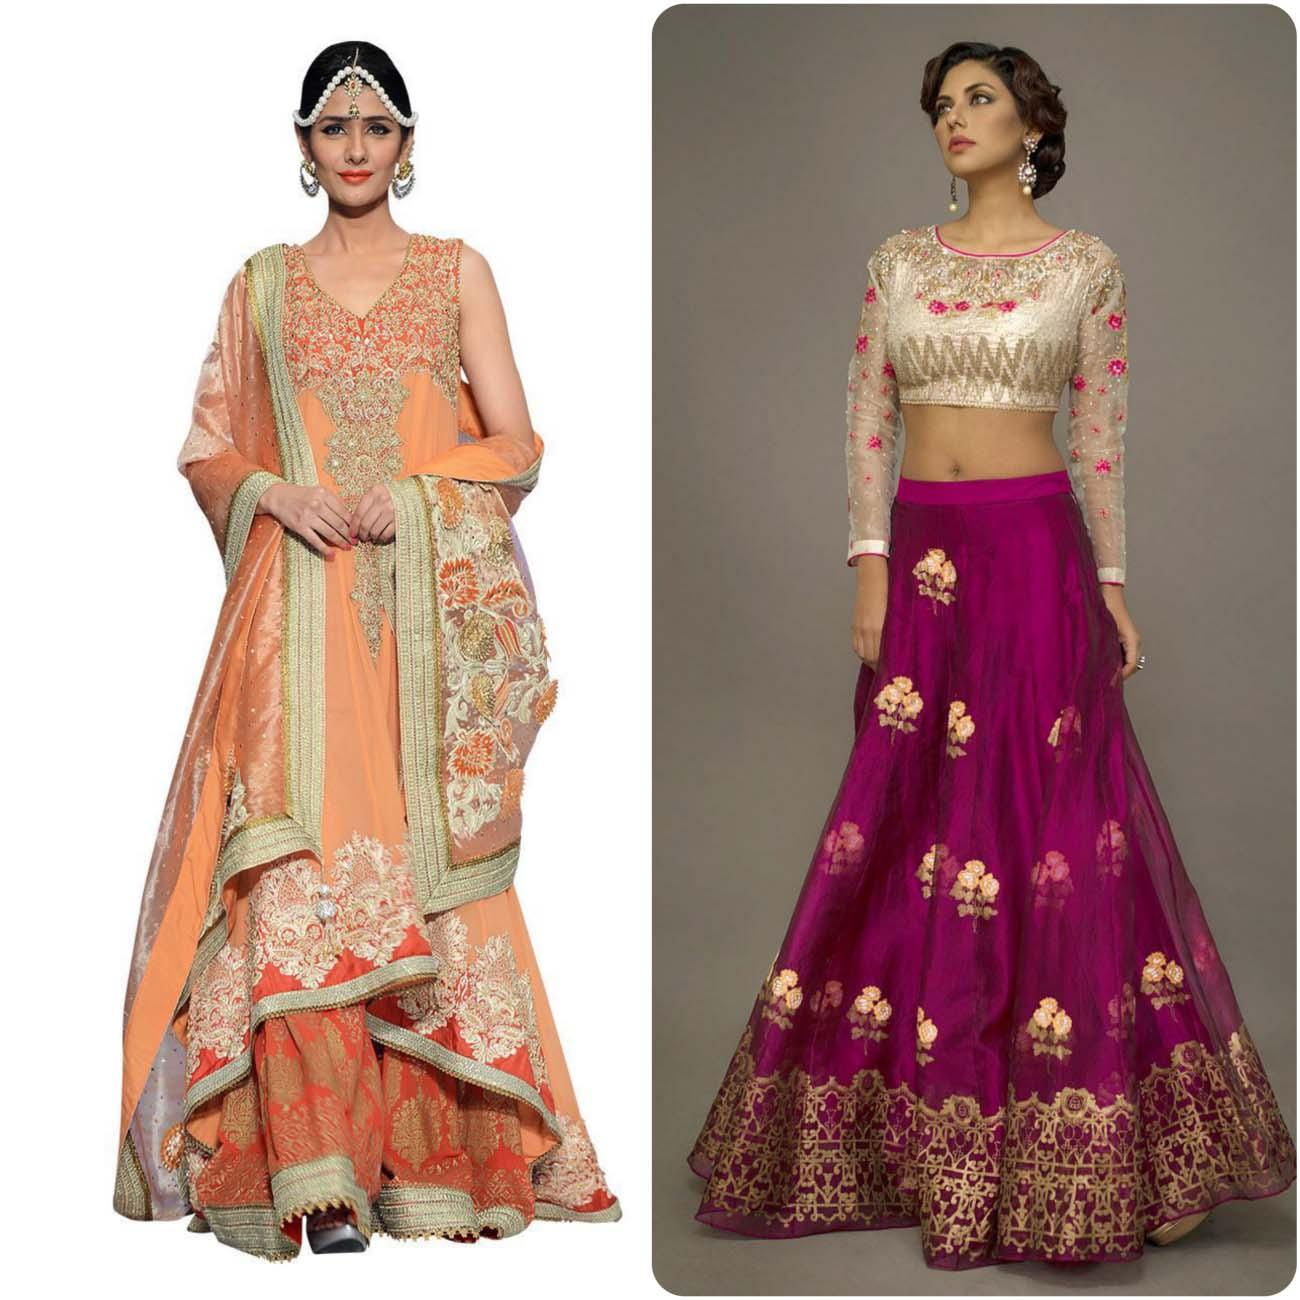 Deepak perwani Wedding Dresses Collection Fo Women 2016-2017...styloplanet (18)